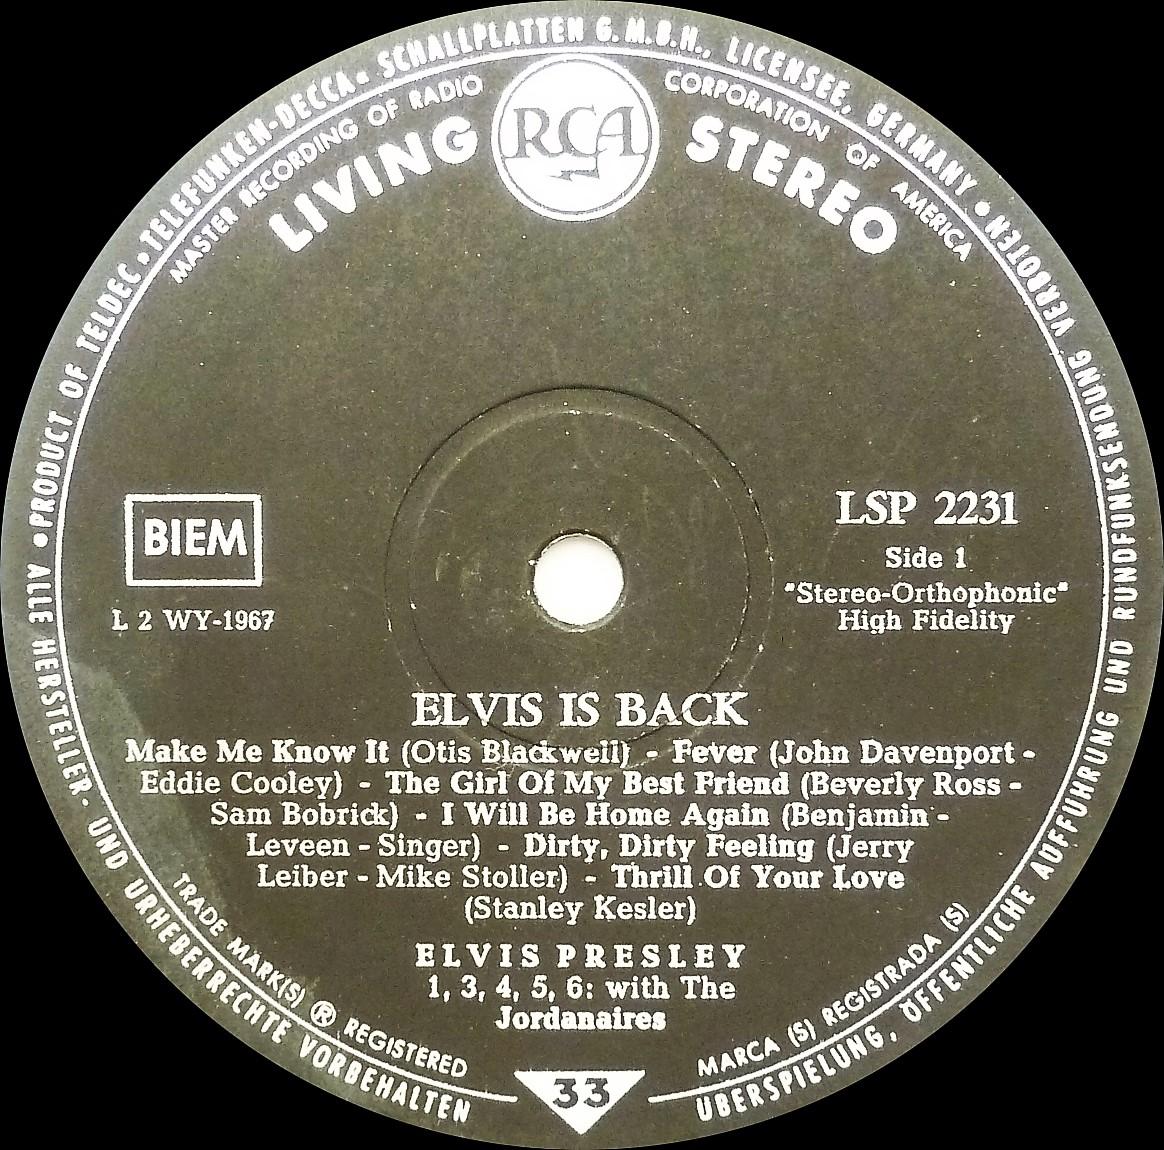 ELVIS IS BACK! Elvisisbacklsplivingsacuvv